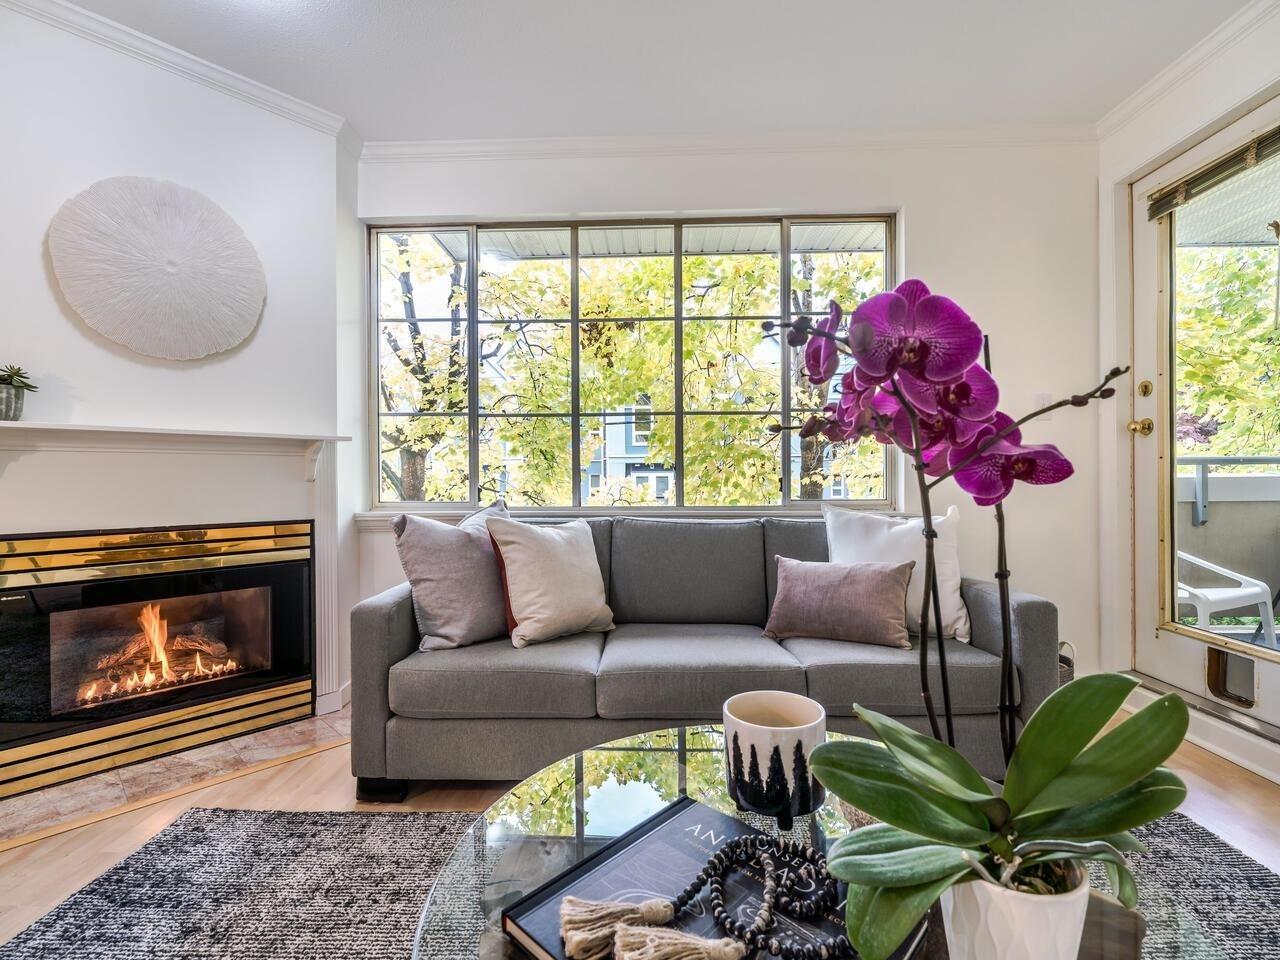 203 825 W 15TH AVENUE - Fairview VW Apartment/Condo for sale, 1 Bedroom (R2625822)